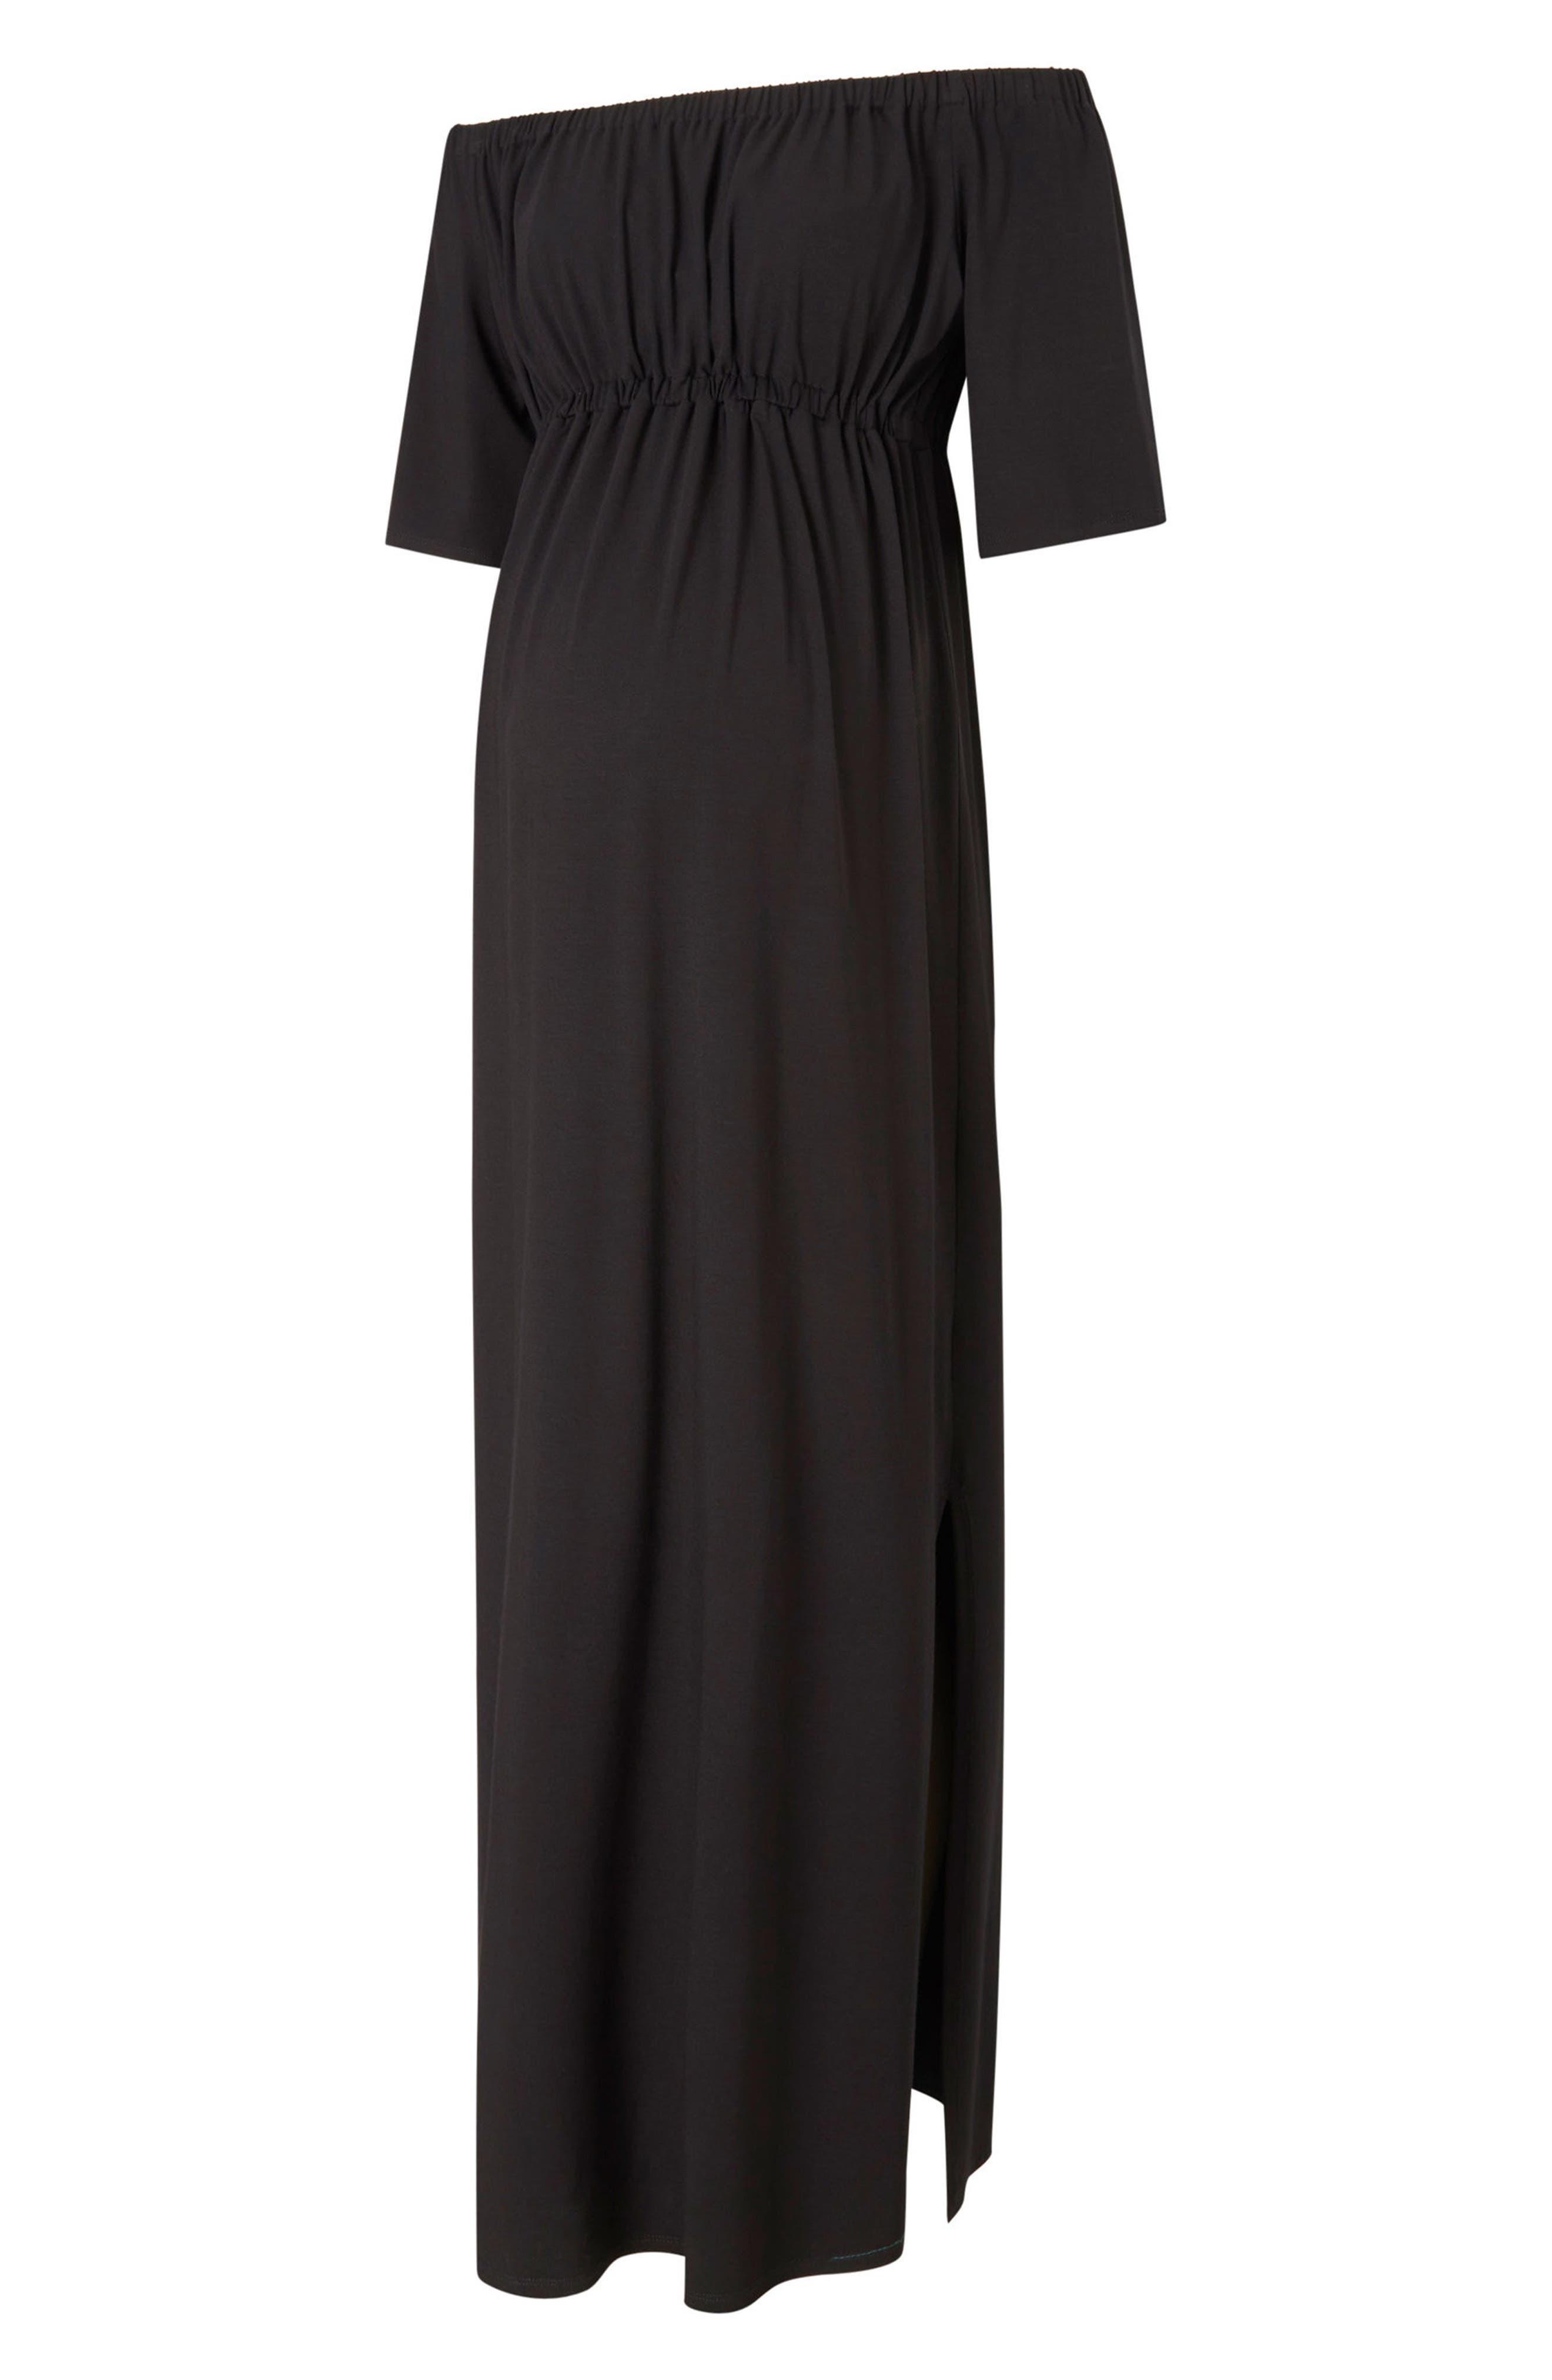 Isabella Oliver Kari Off the Shoulder Maternity Maxi Dress